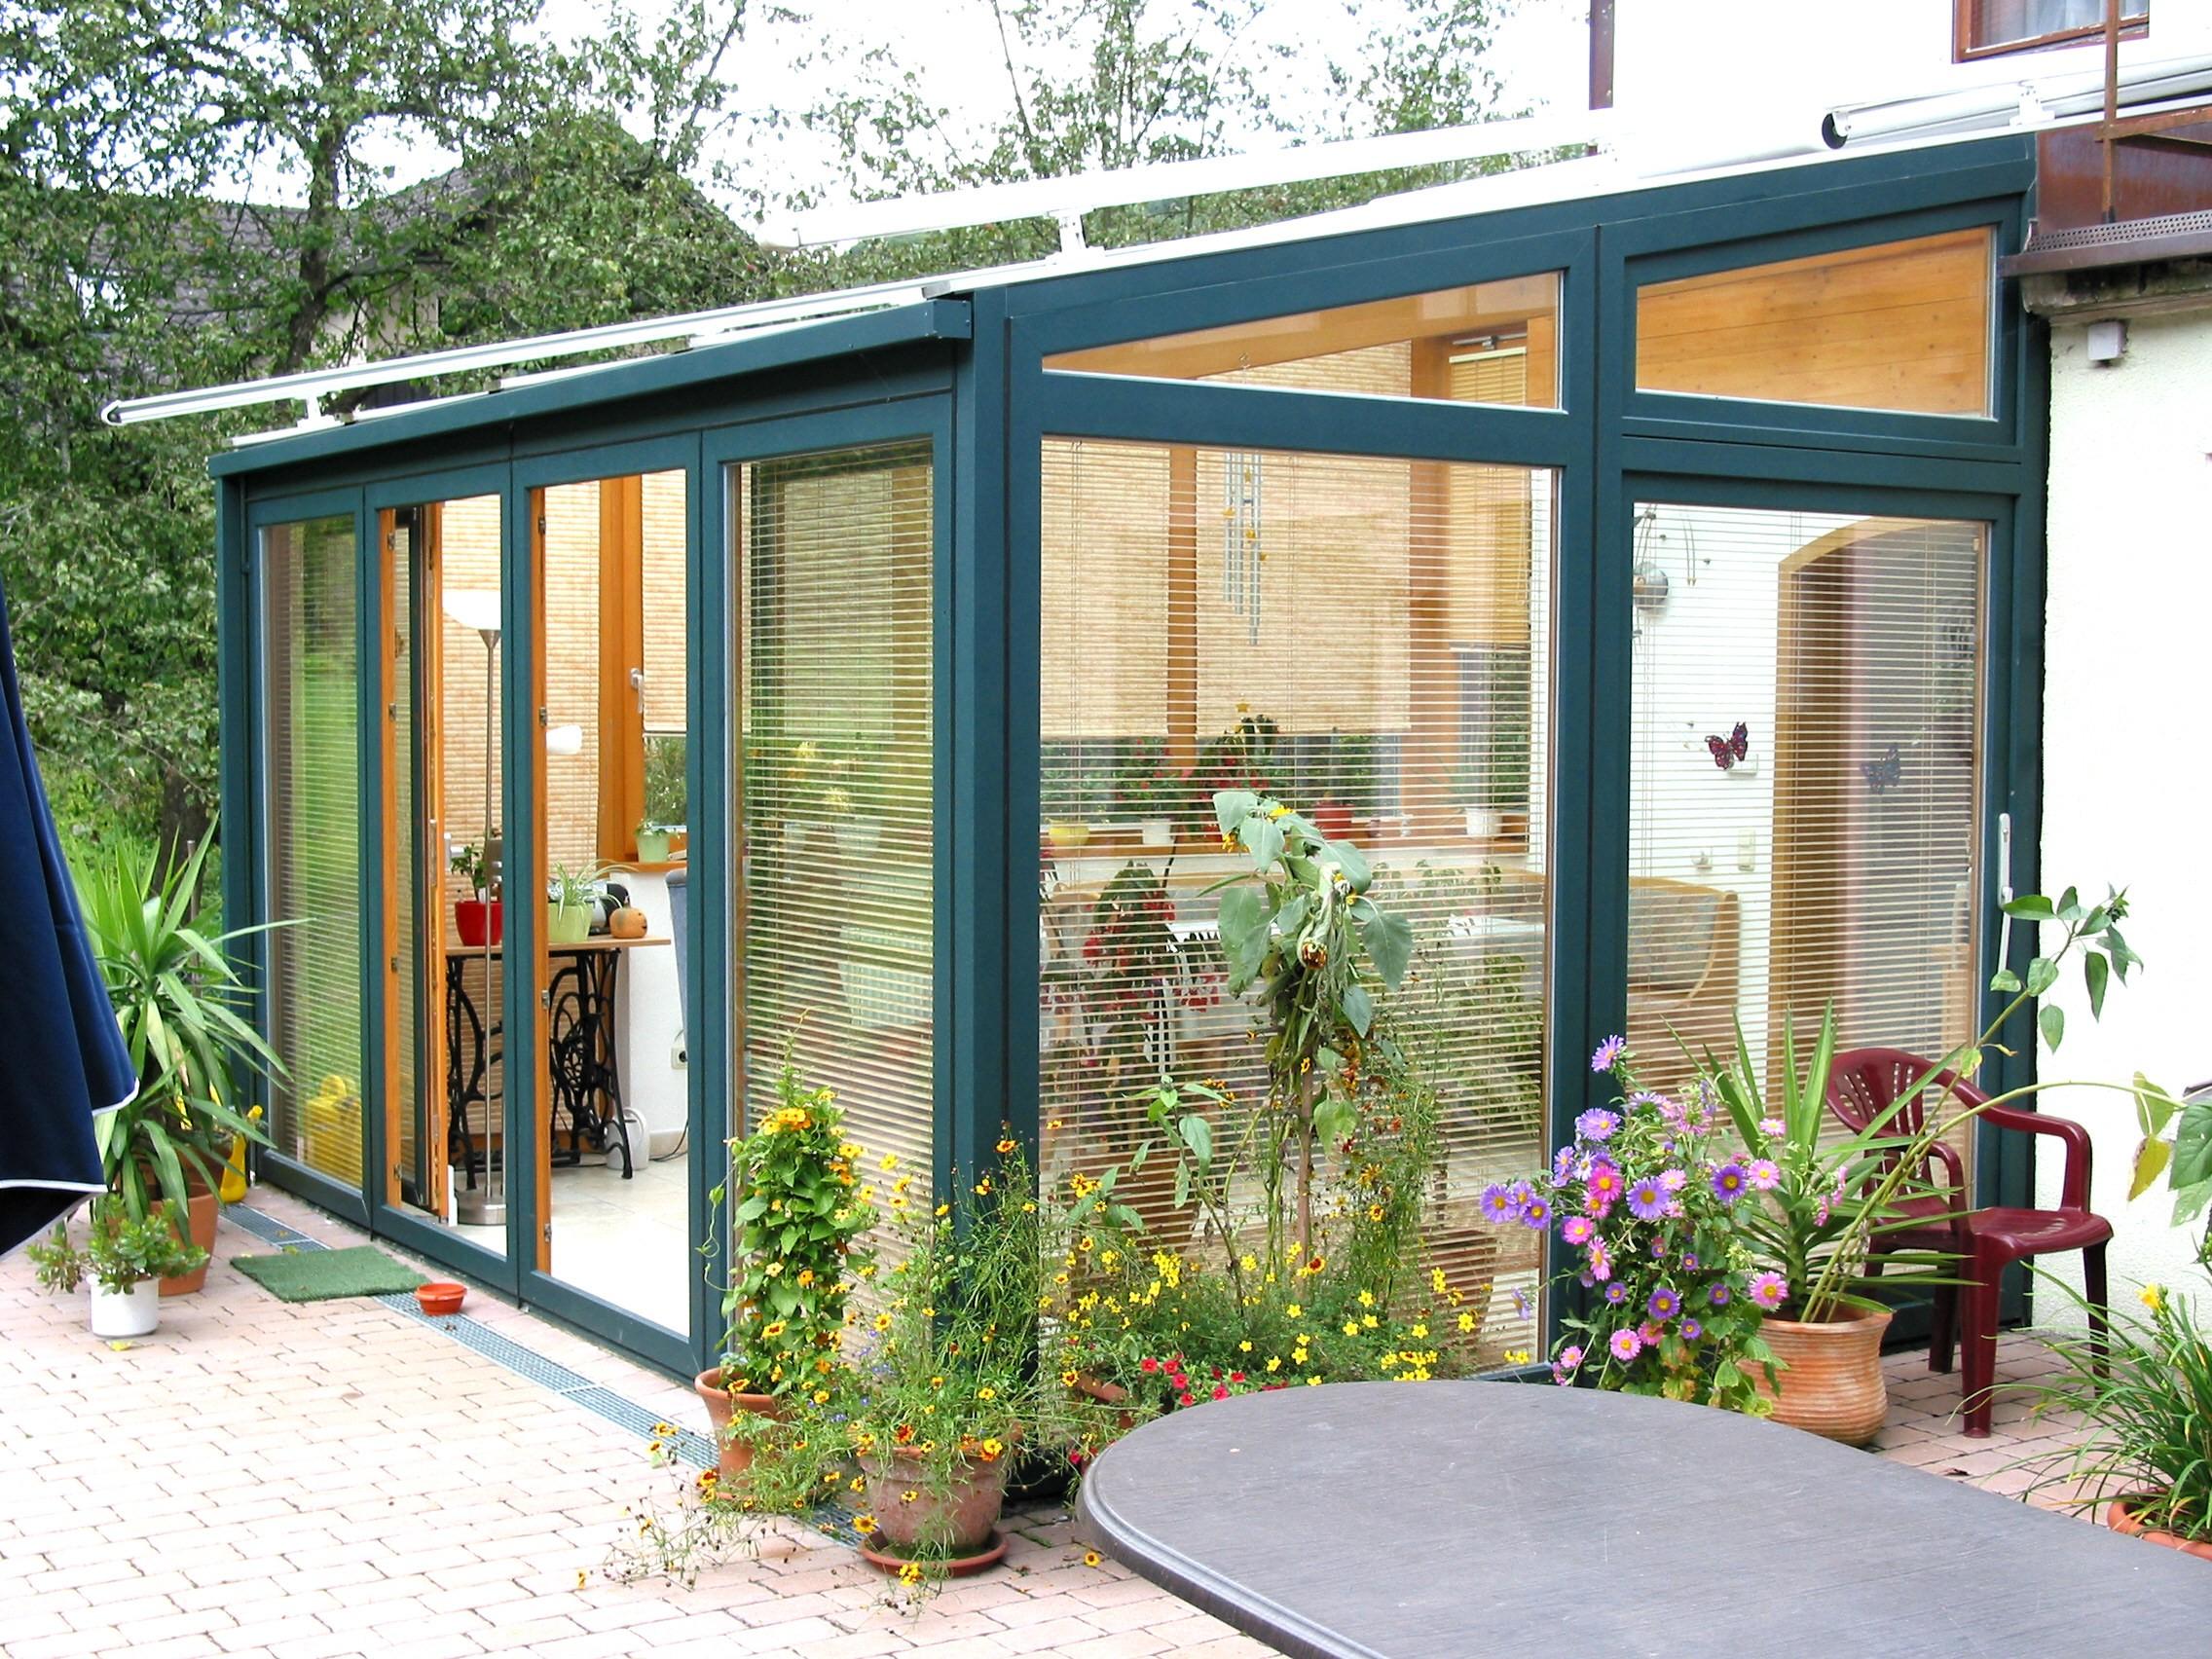 wintergarten a01 reitz gmbh. Black Bedroom Furniture Sets. Home Design Ideas